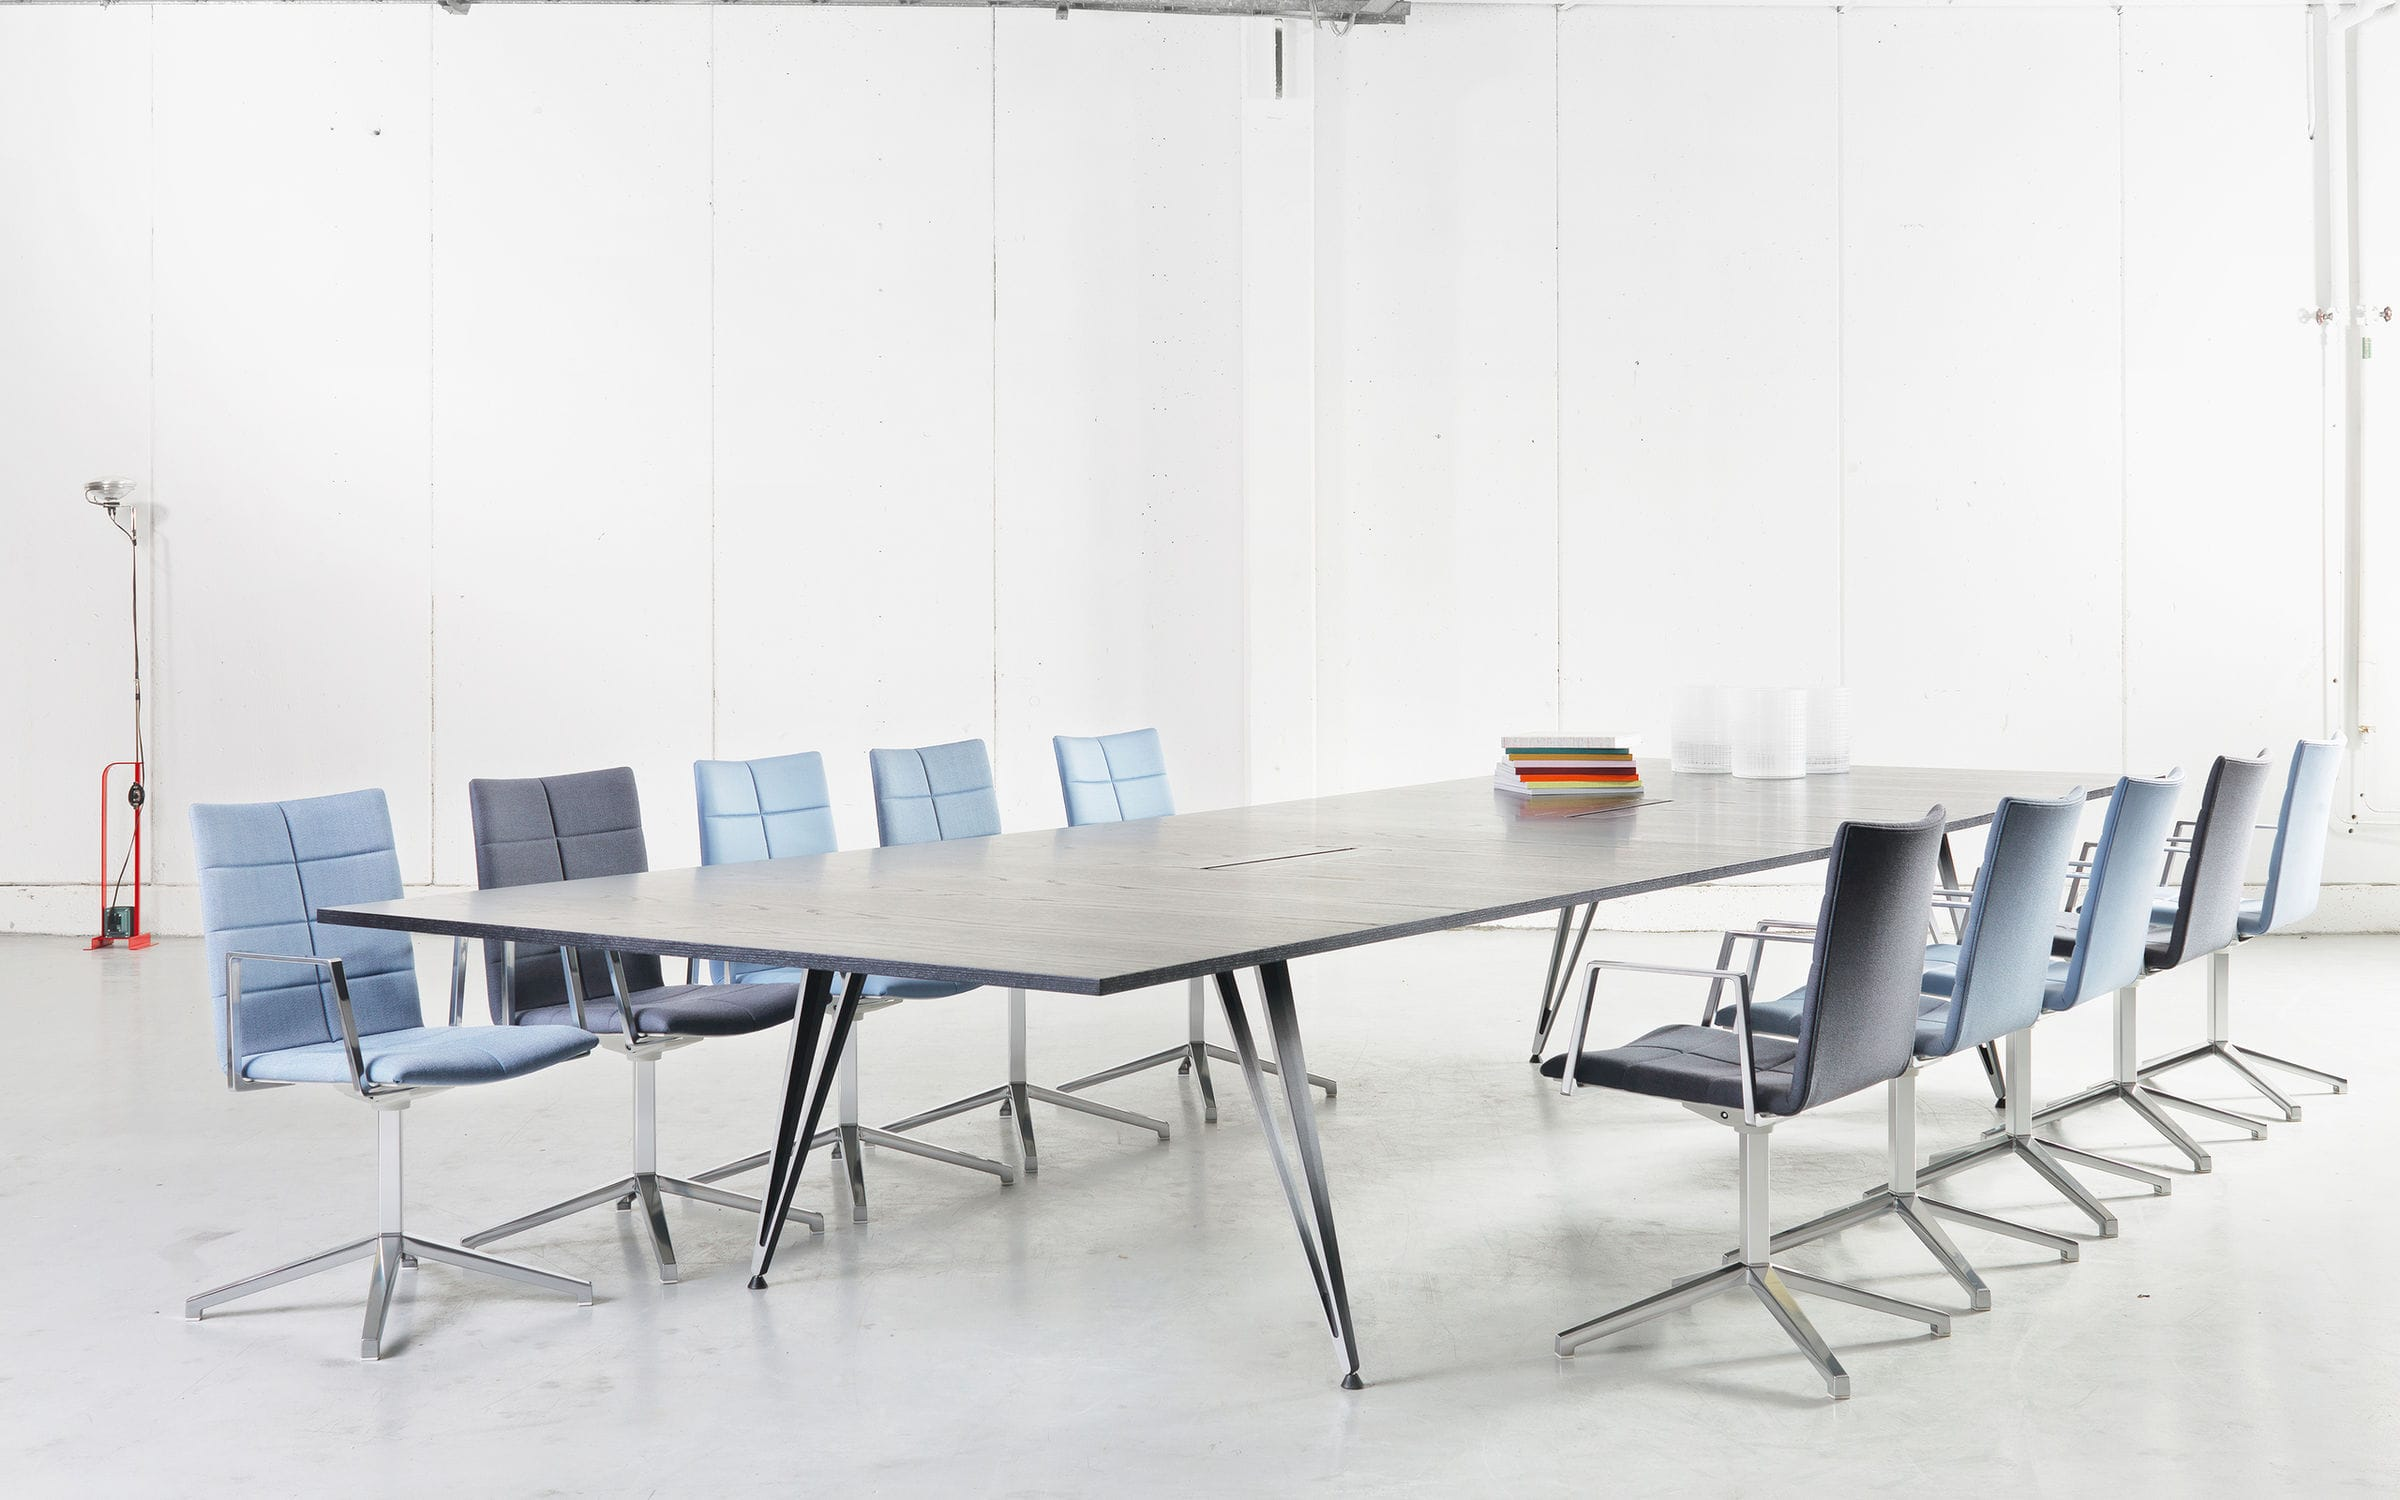 Contemporary Conference Table Ash Linoleum Laminate Attach By Troels Grum Schwensen